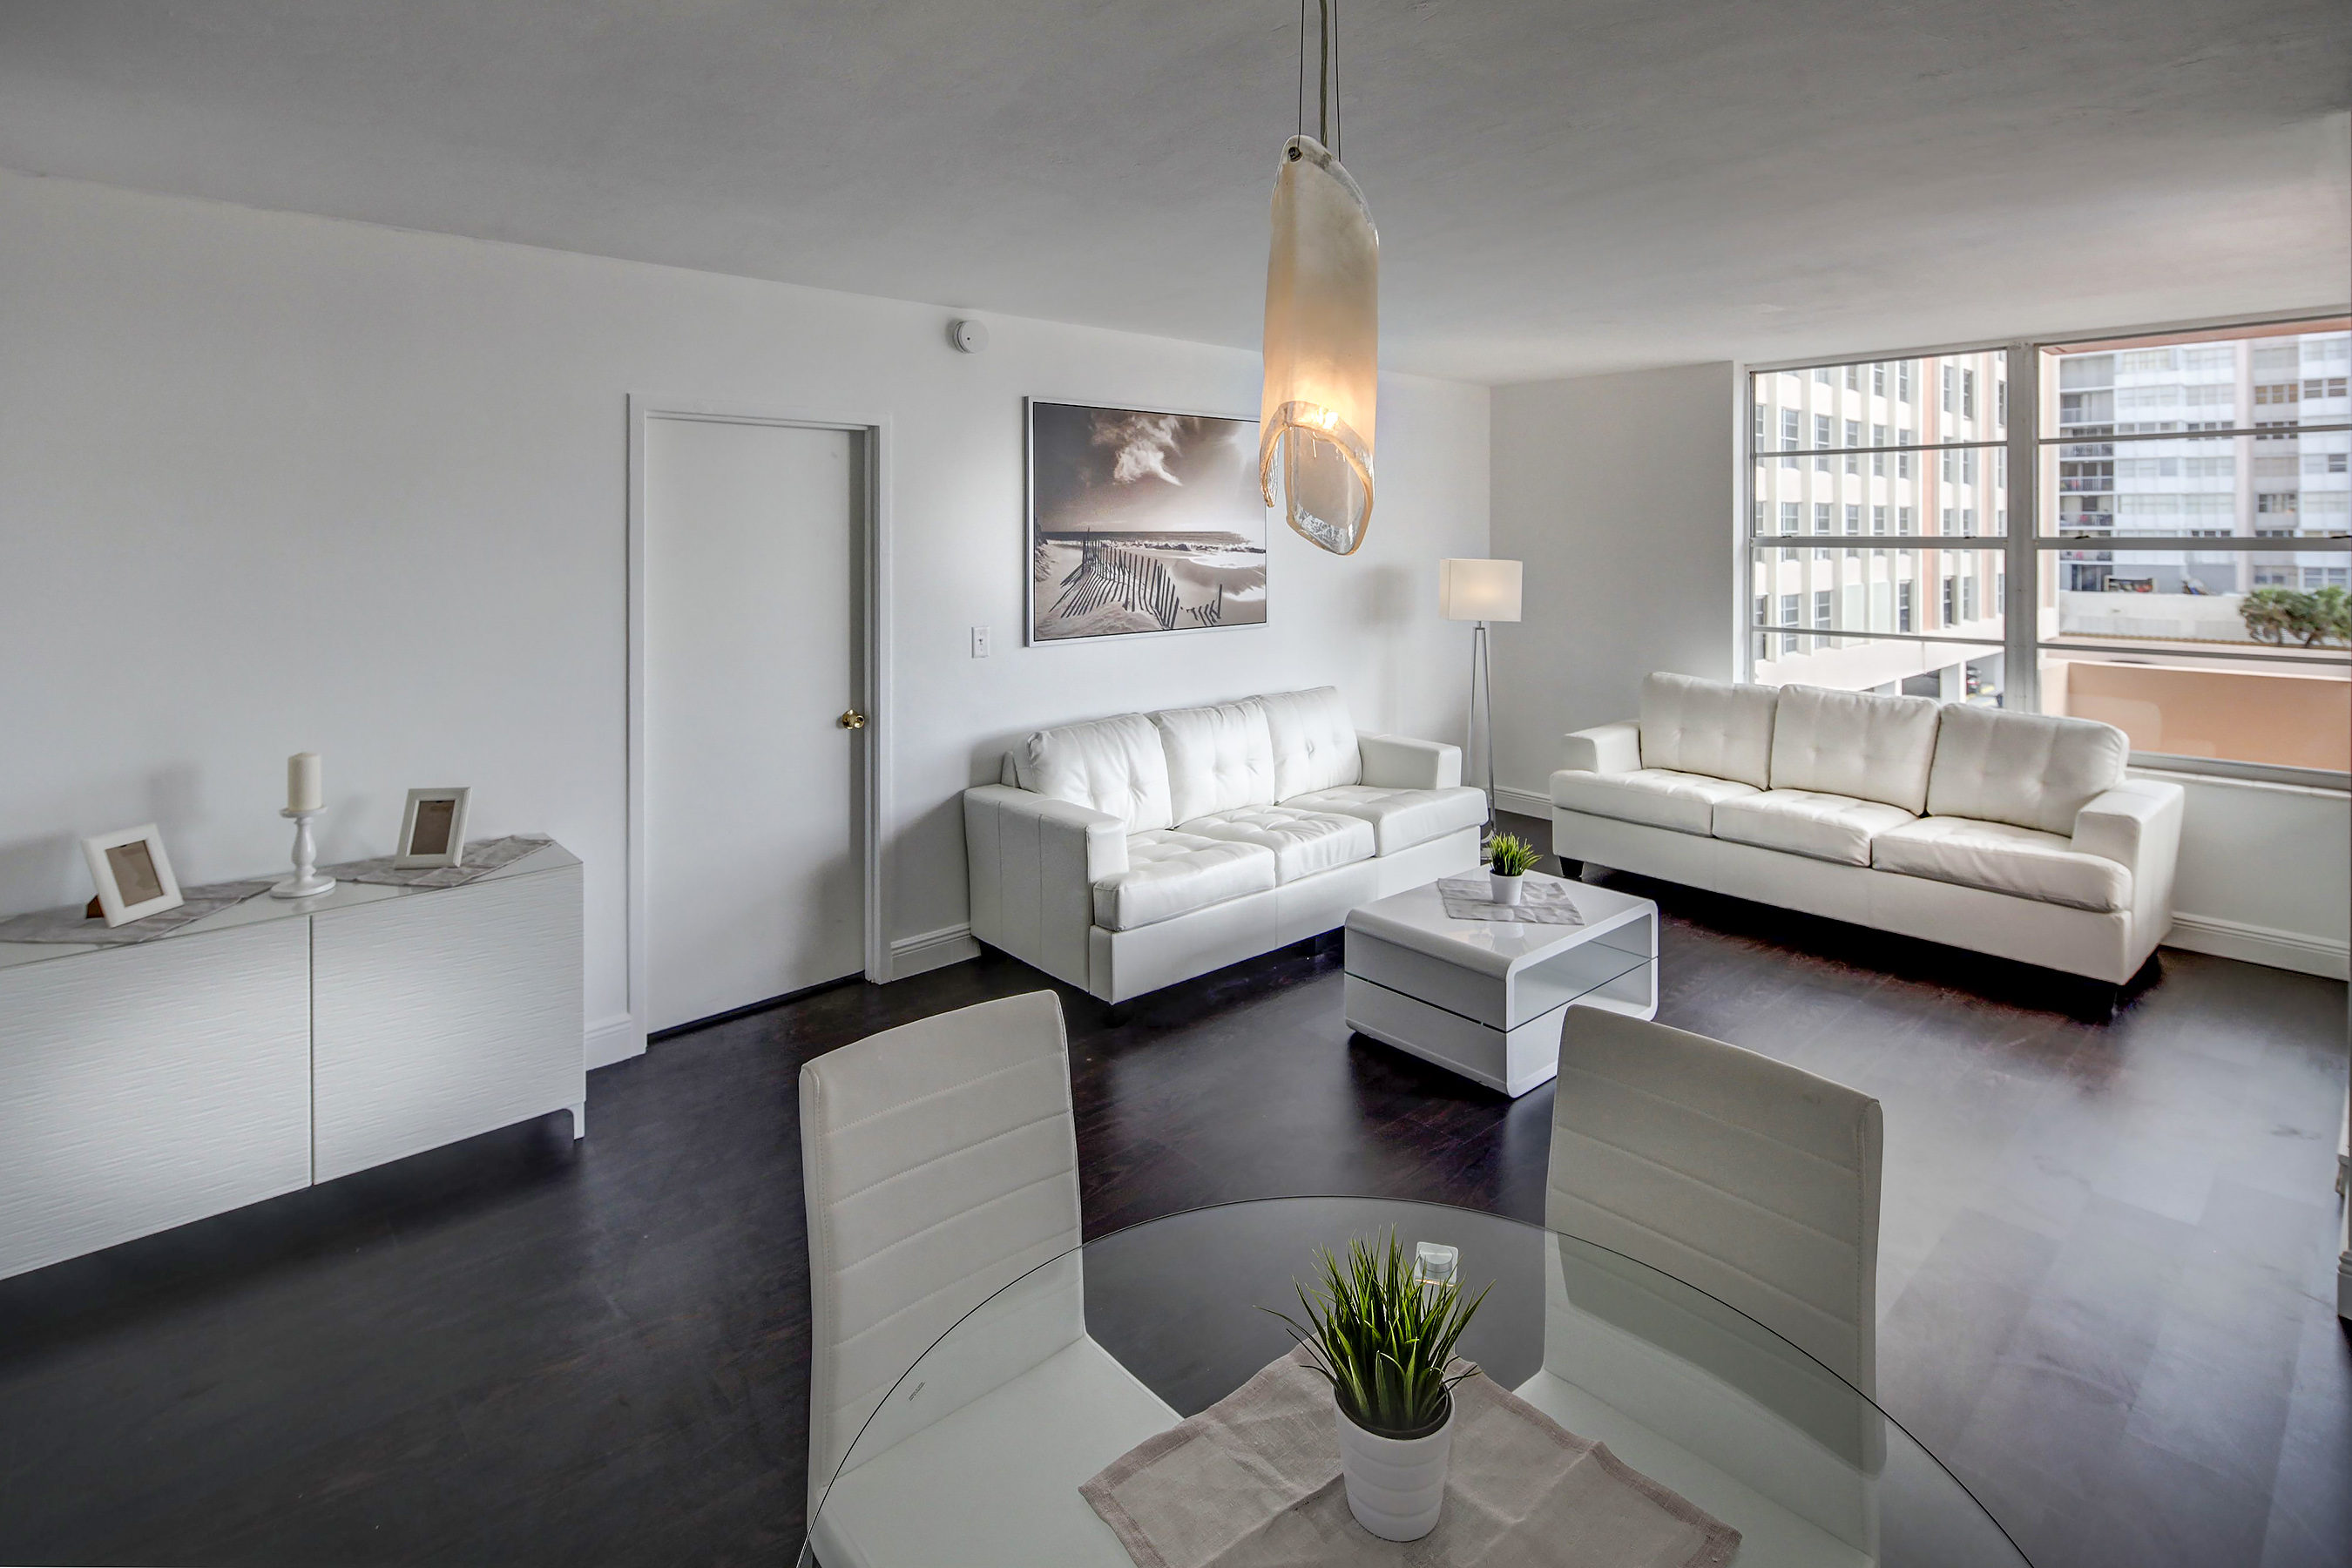 Condominium for Sale at 2899 Collins Ave #524 2899 Collins Ave 524 Miami Beach, Florida, 33140 United States